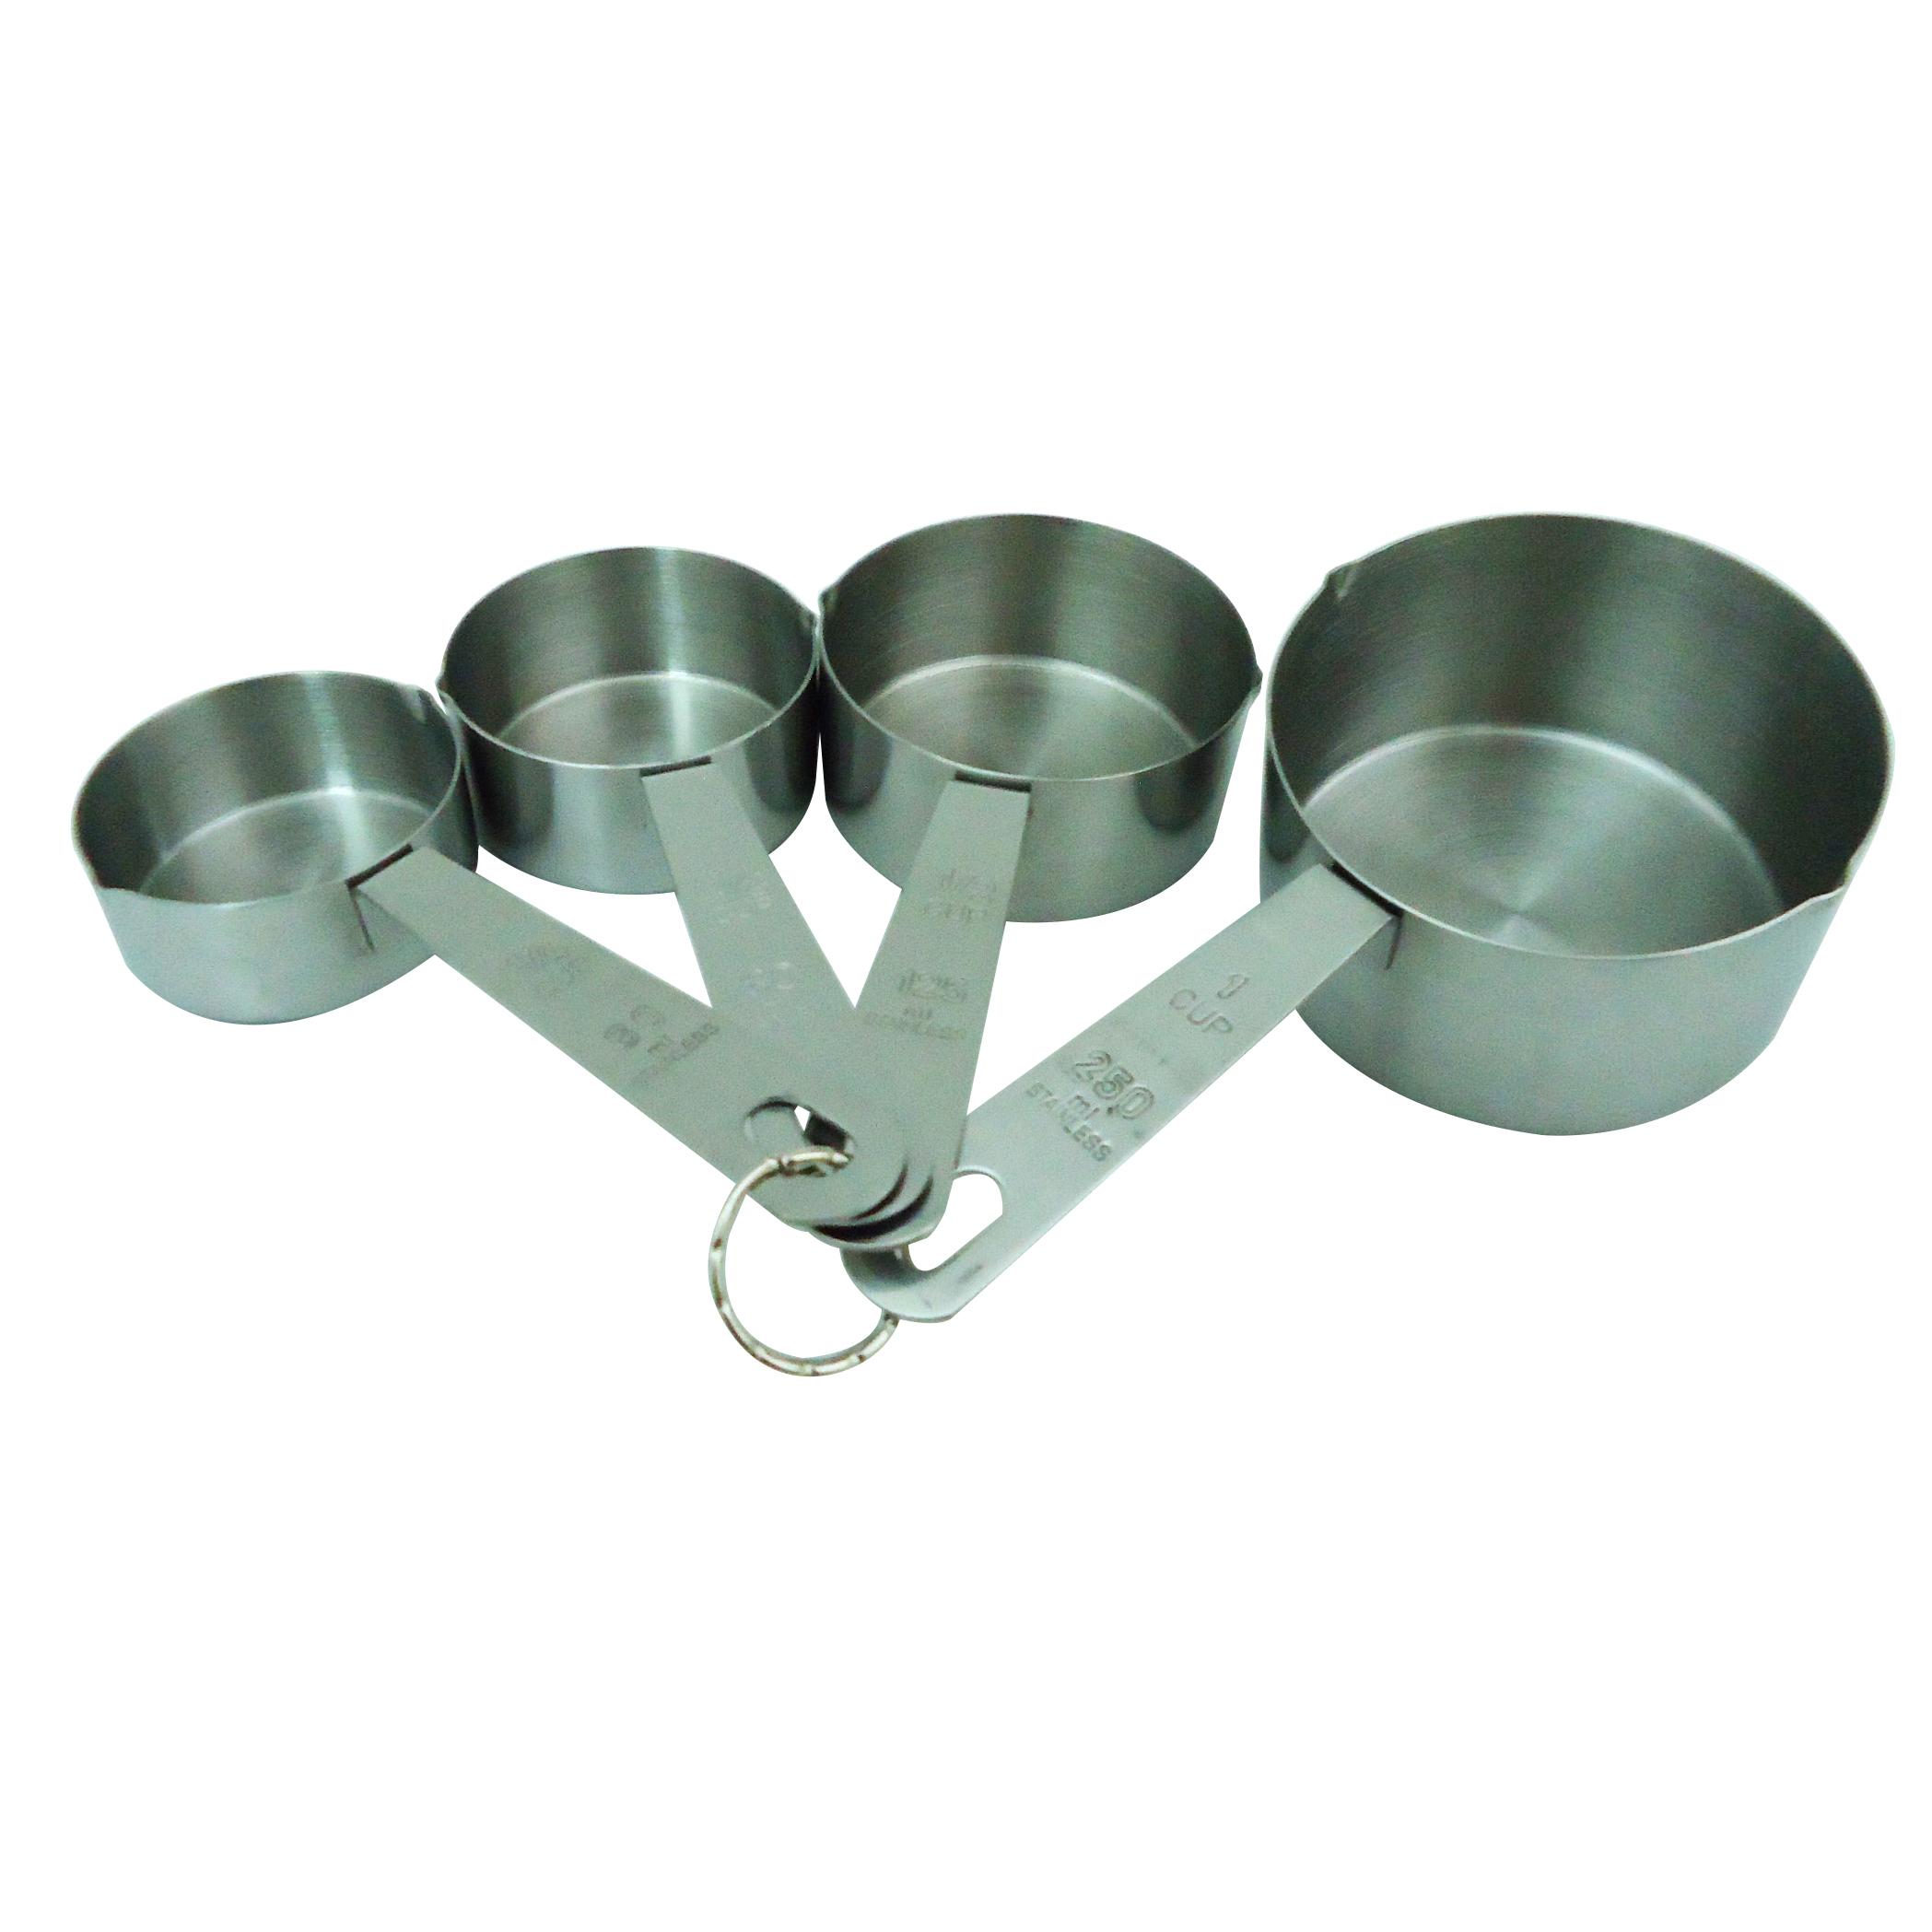 Lacor 67007 Σετ 4 Τεμαχίων Μεζούρες 60-80-125-250 ml επαγγελματικός εξοπλισμός   επαγγελματικά σκεύη εργαλεία κουζίνας μαχαίρια είδη